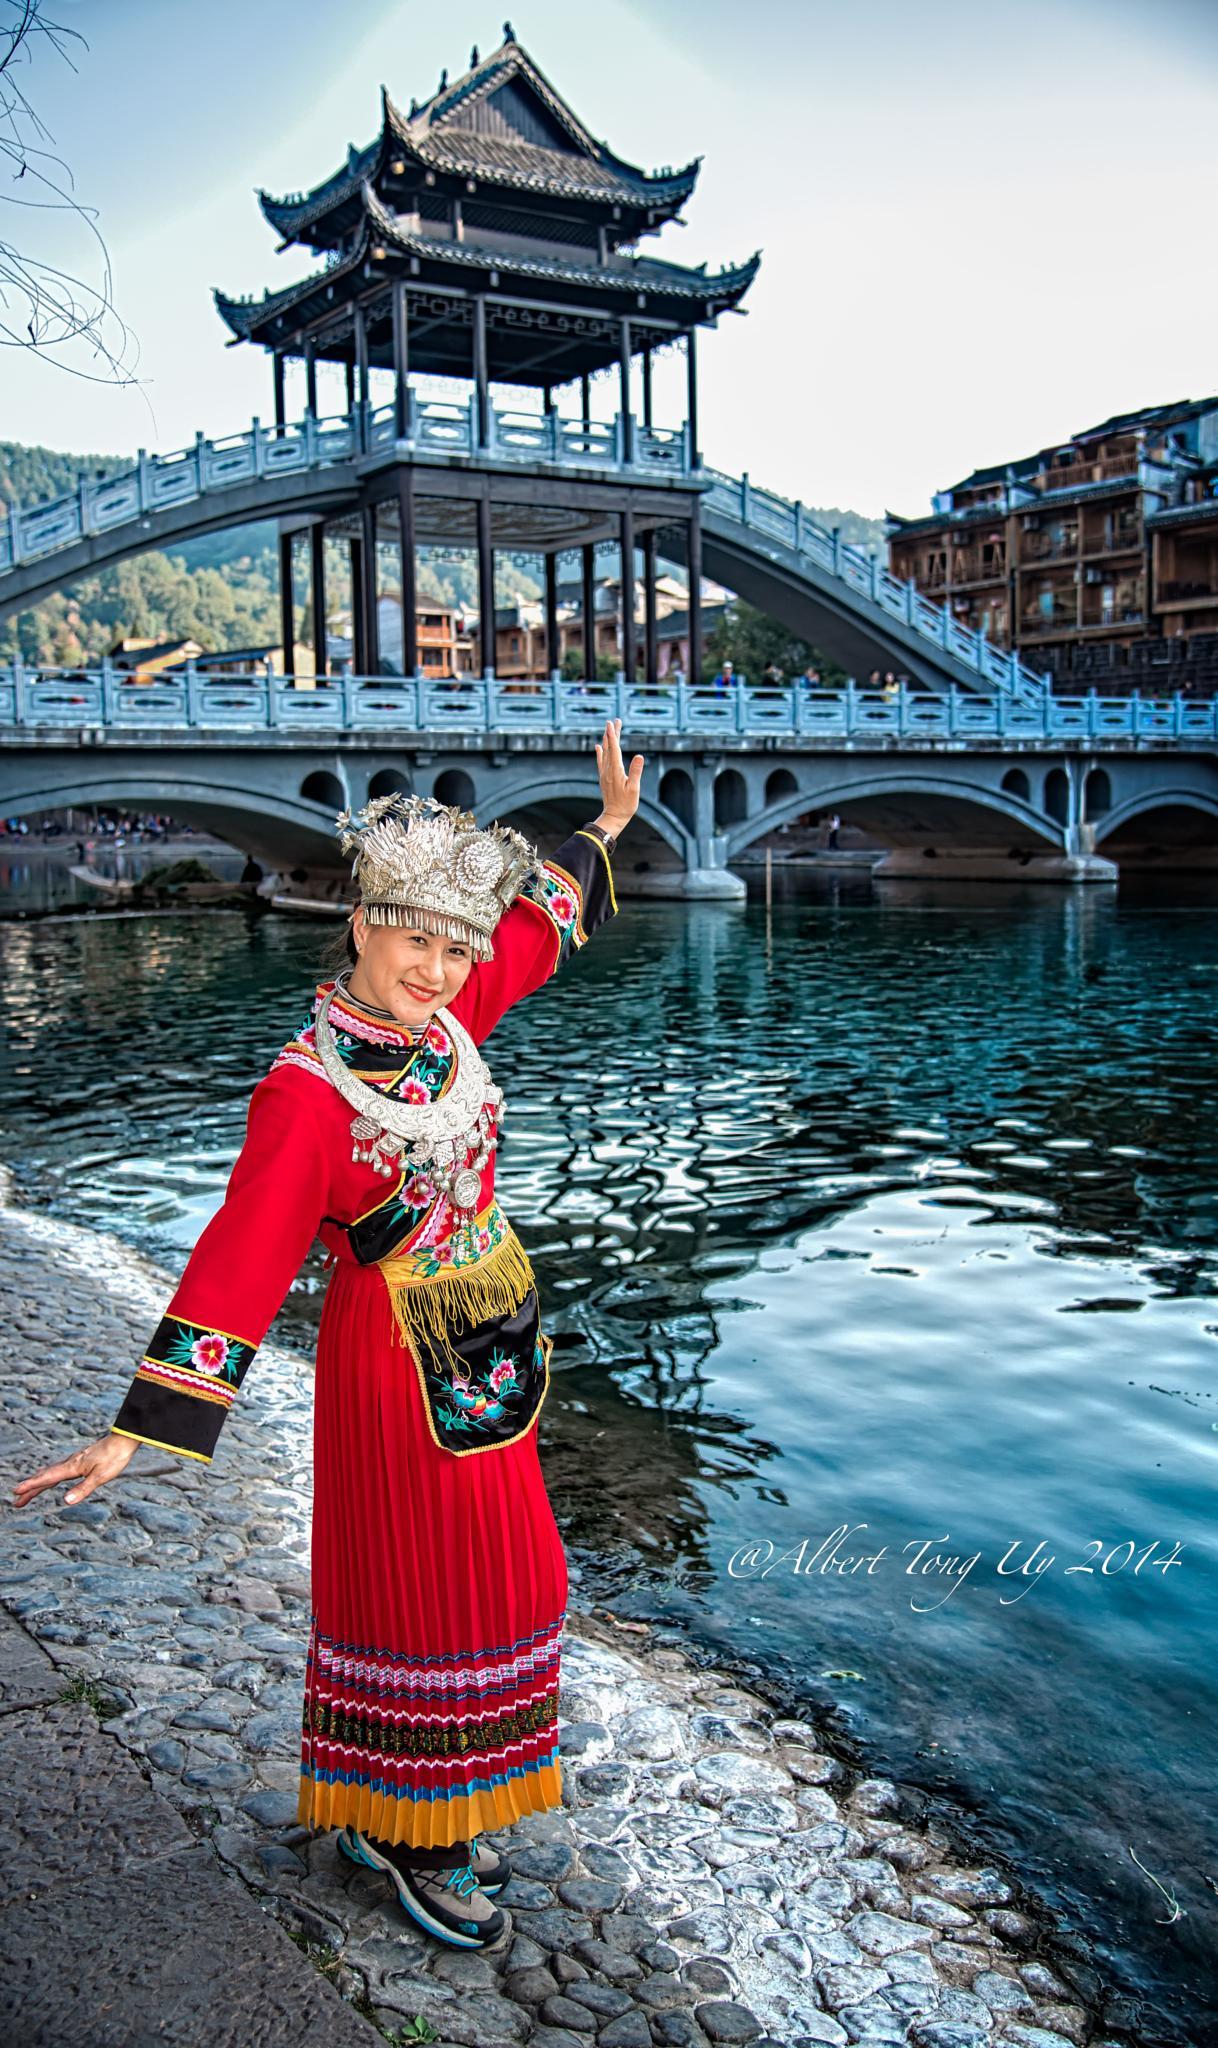 My Wife My Model, in Phoenix Old Town, Hunan, China,  photo 14 by iatu8888